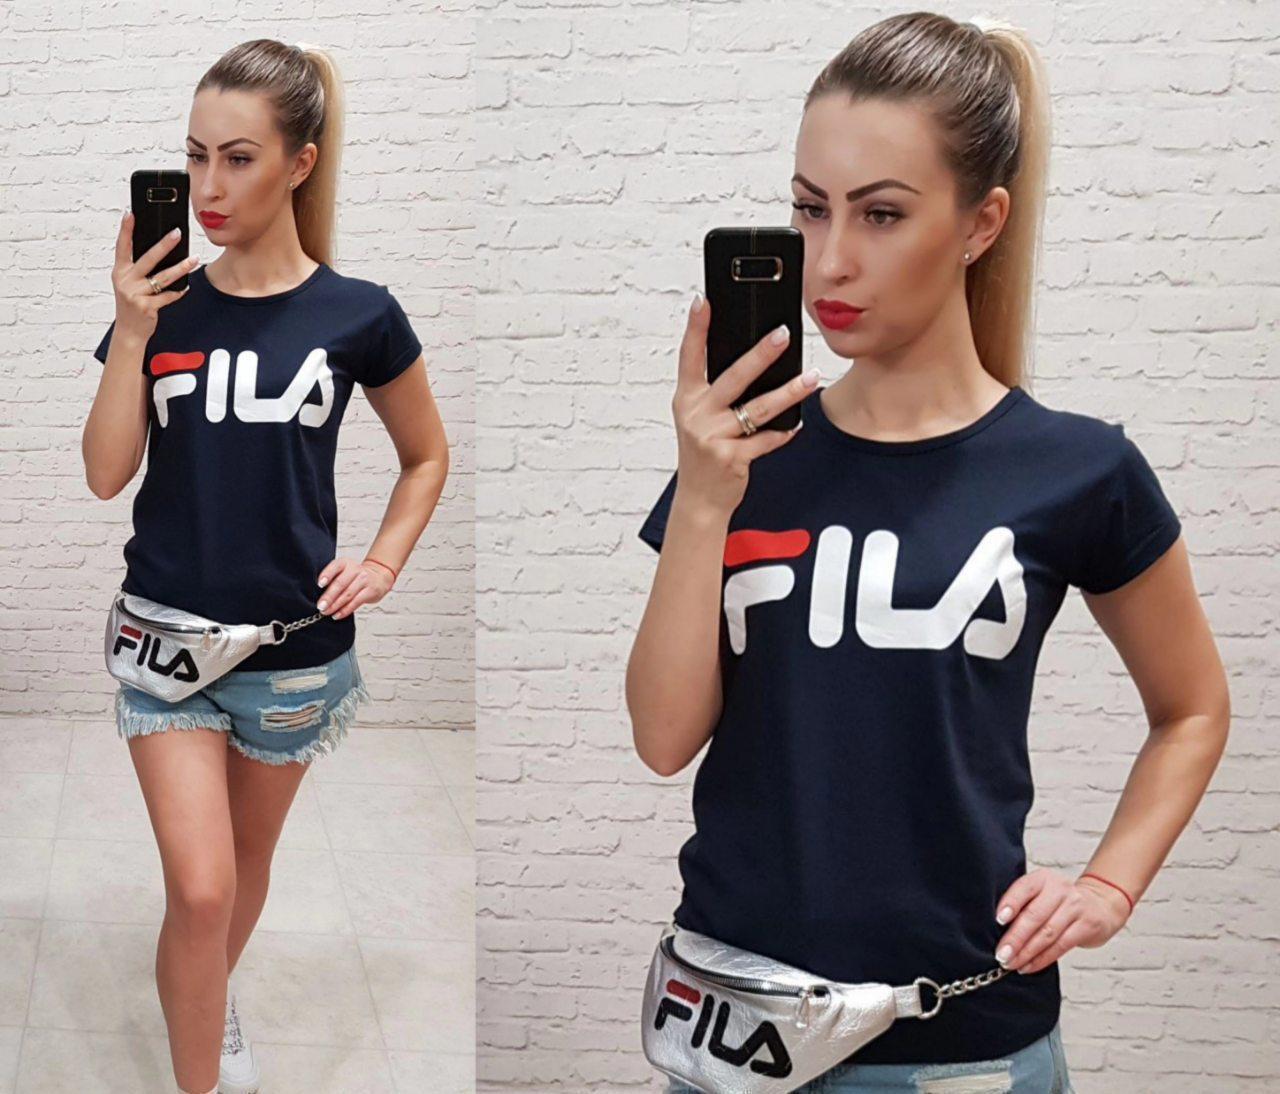 Женская футболка  реплика Fila 100% катон качество турция, фото 1